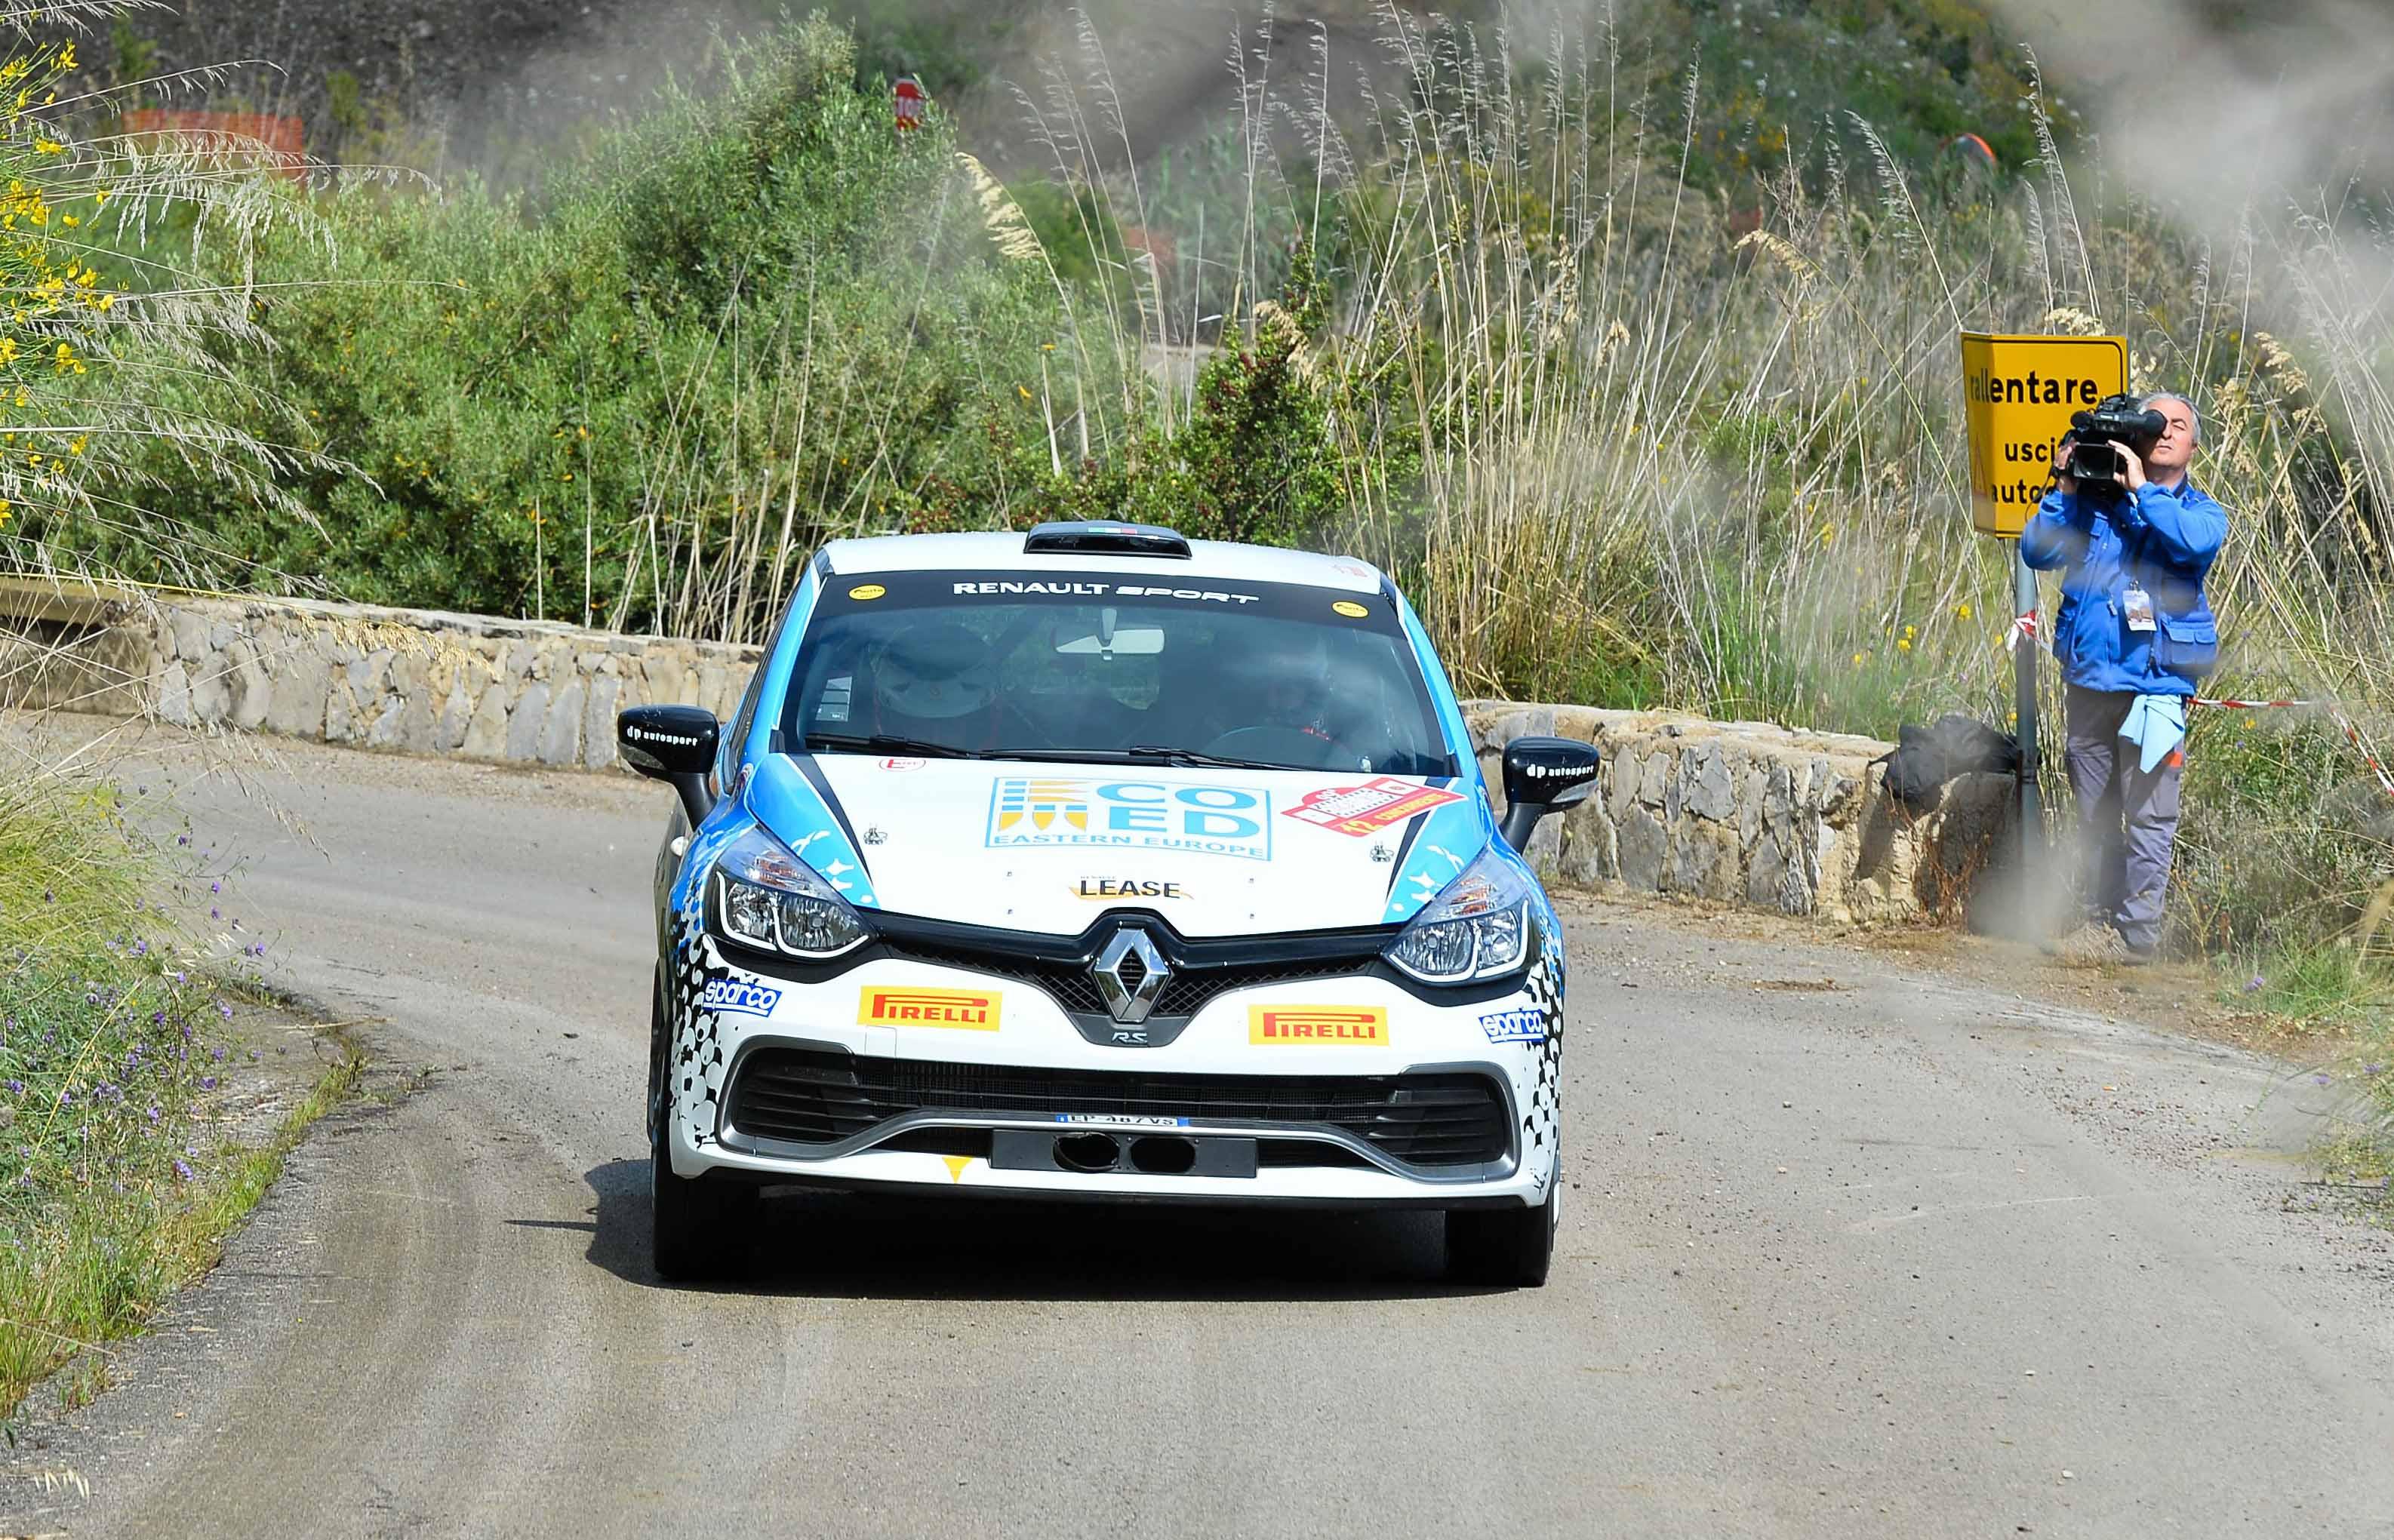 Renault alla Targa Florio